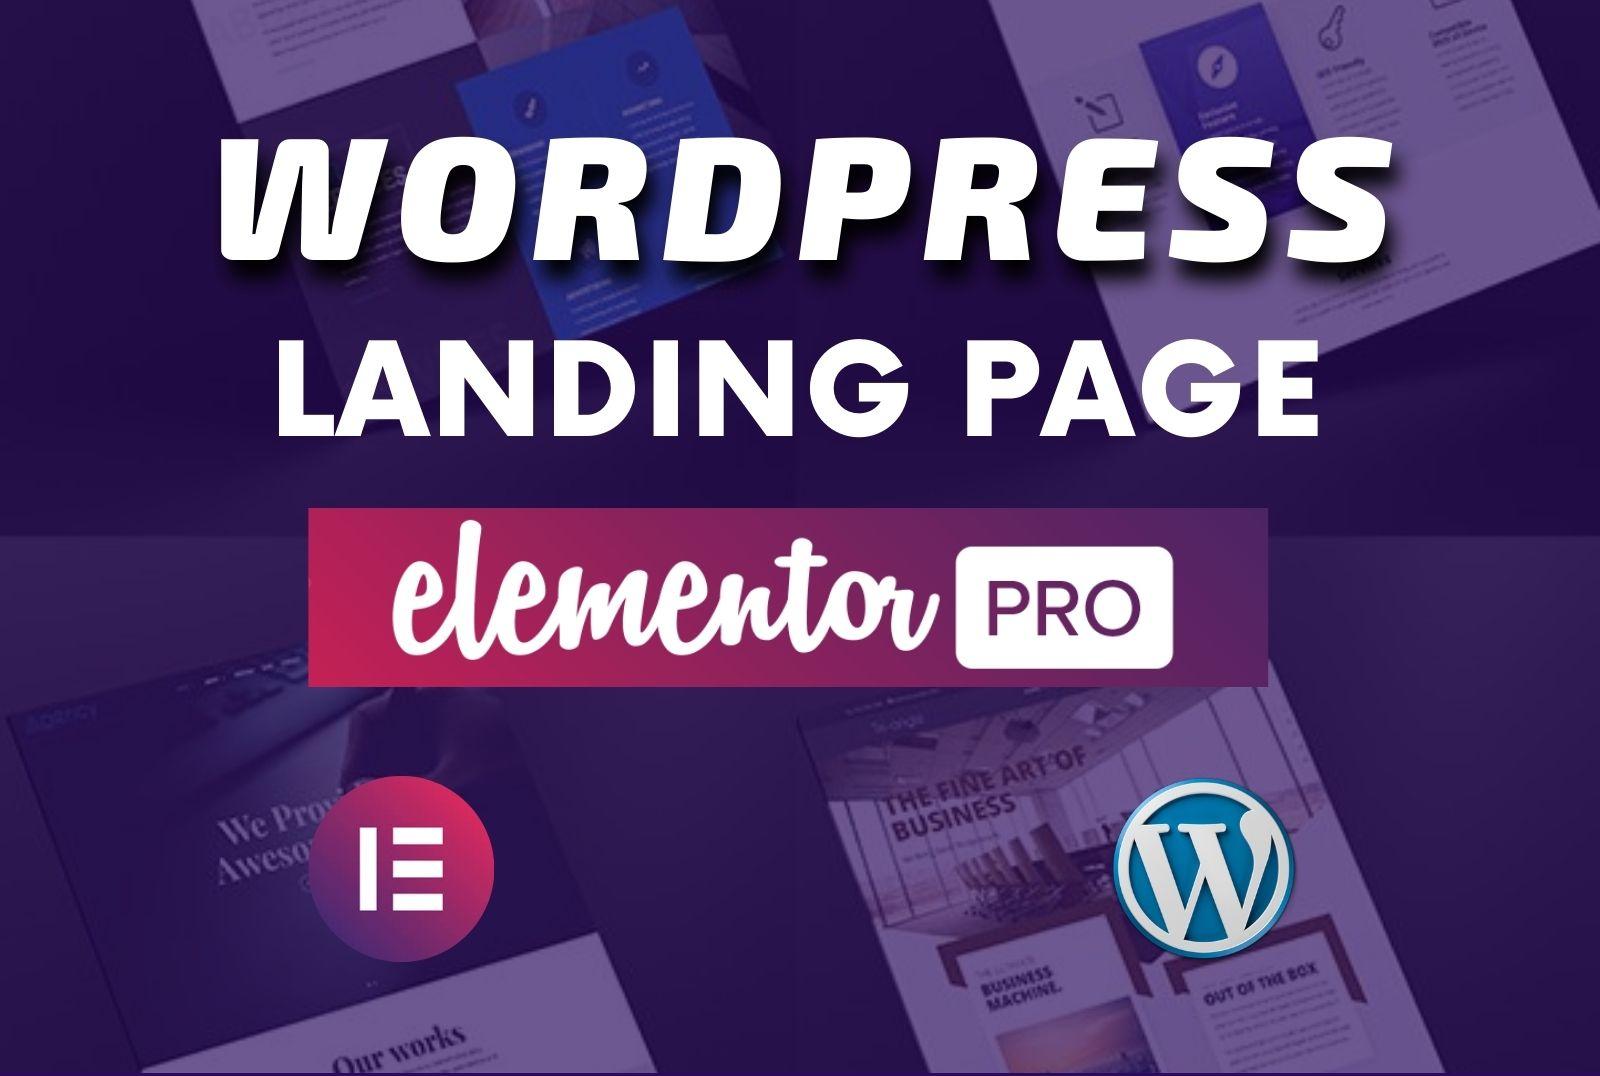 Design a professional landing page or wordpress website